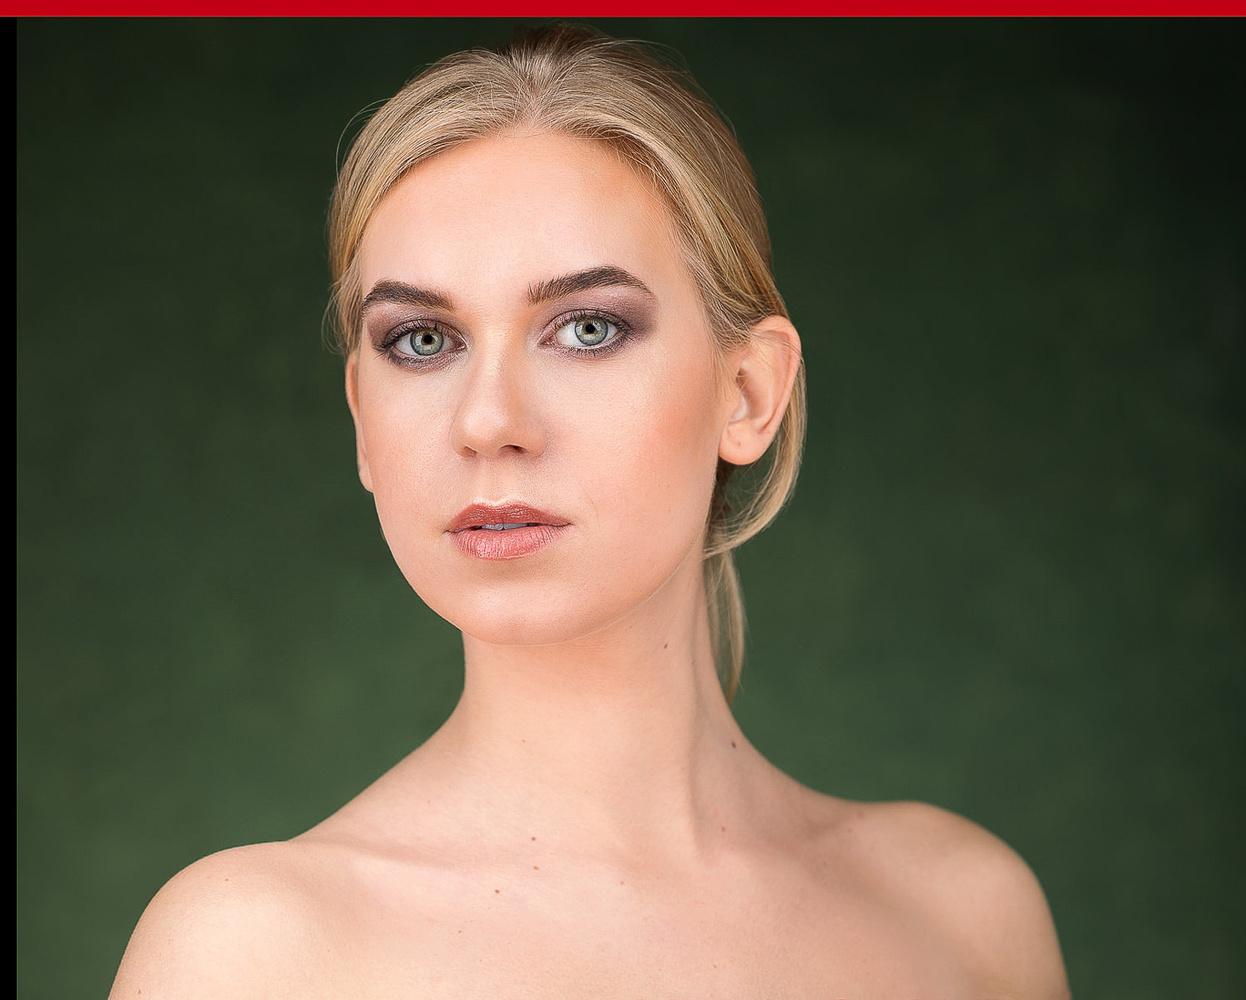 portfolioshoot-model-angelika-green-eyes by Bart van Hattem